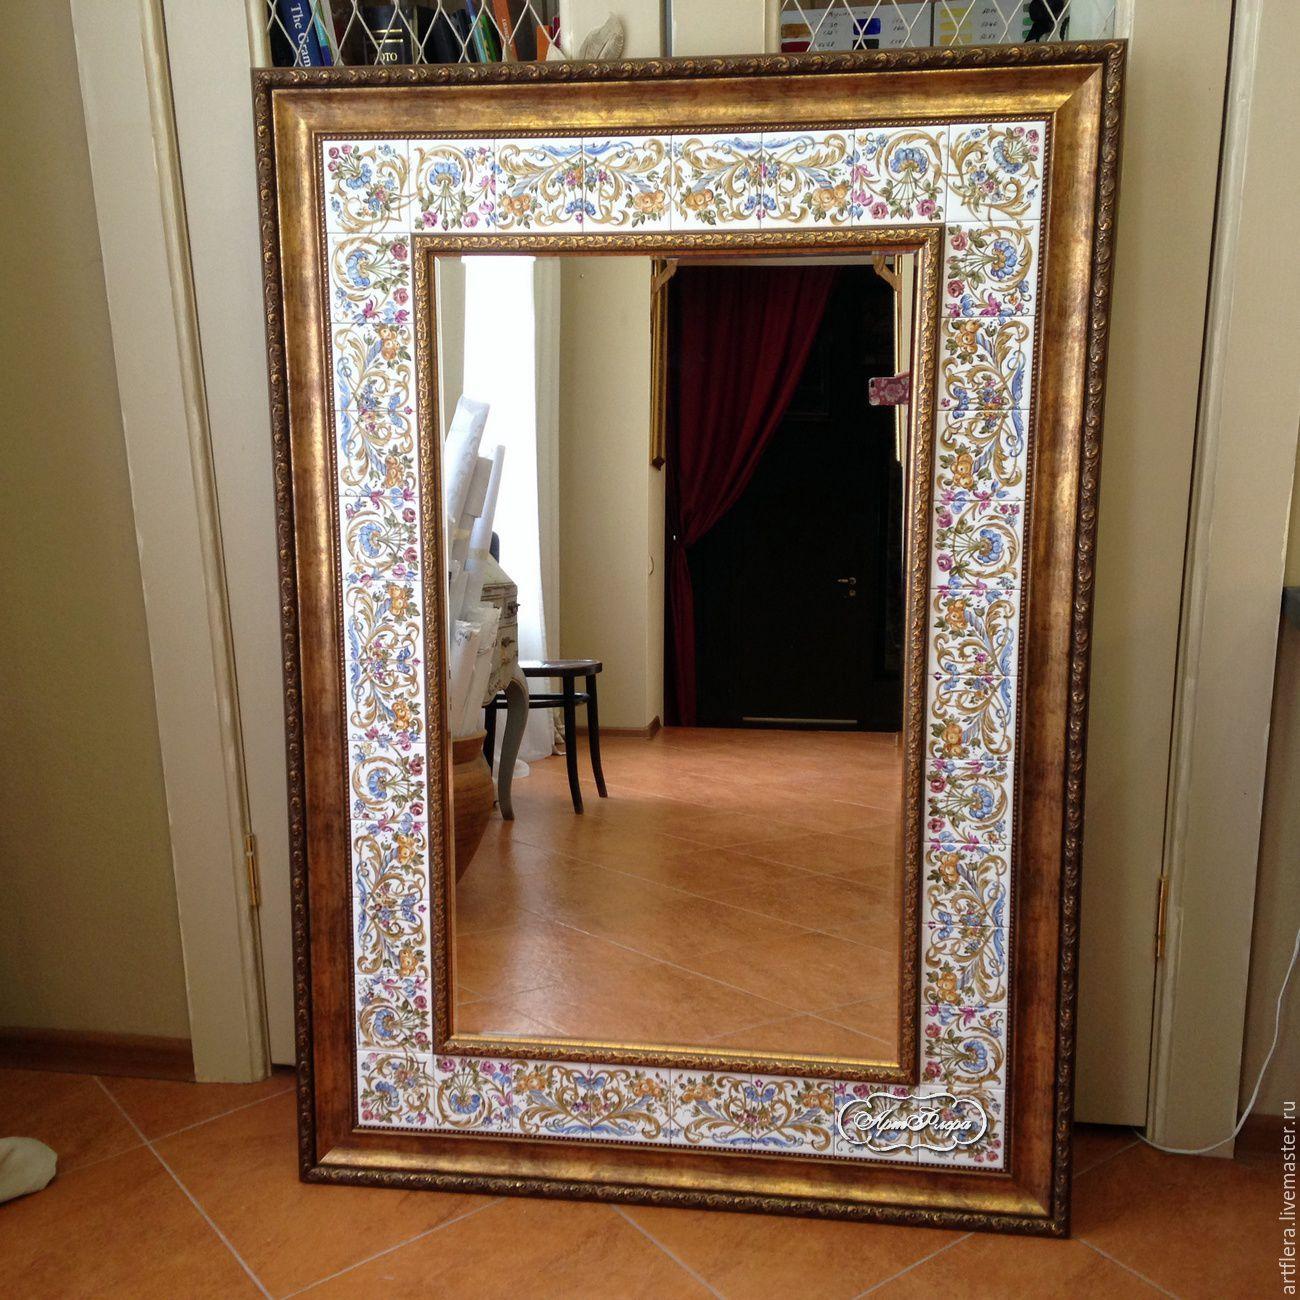 Painted mirror the Mirror in the bathroom, Mirror, Kazan,  Фото №1